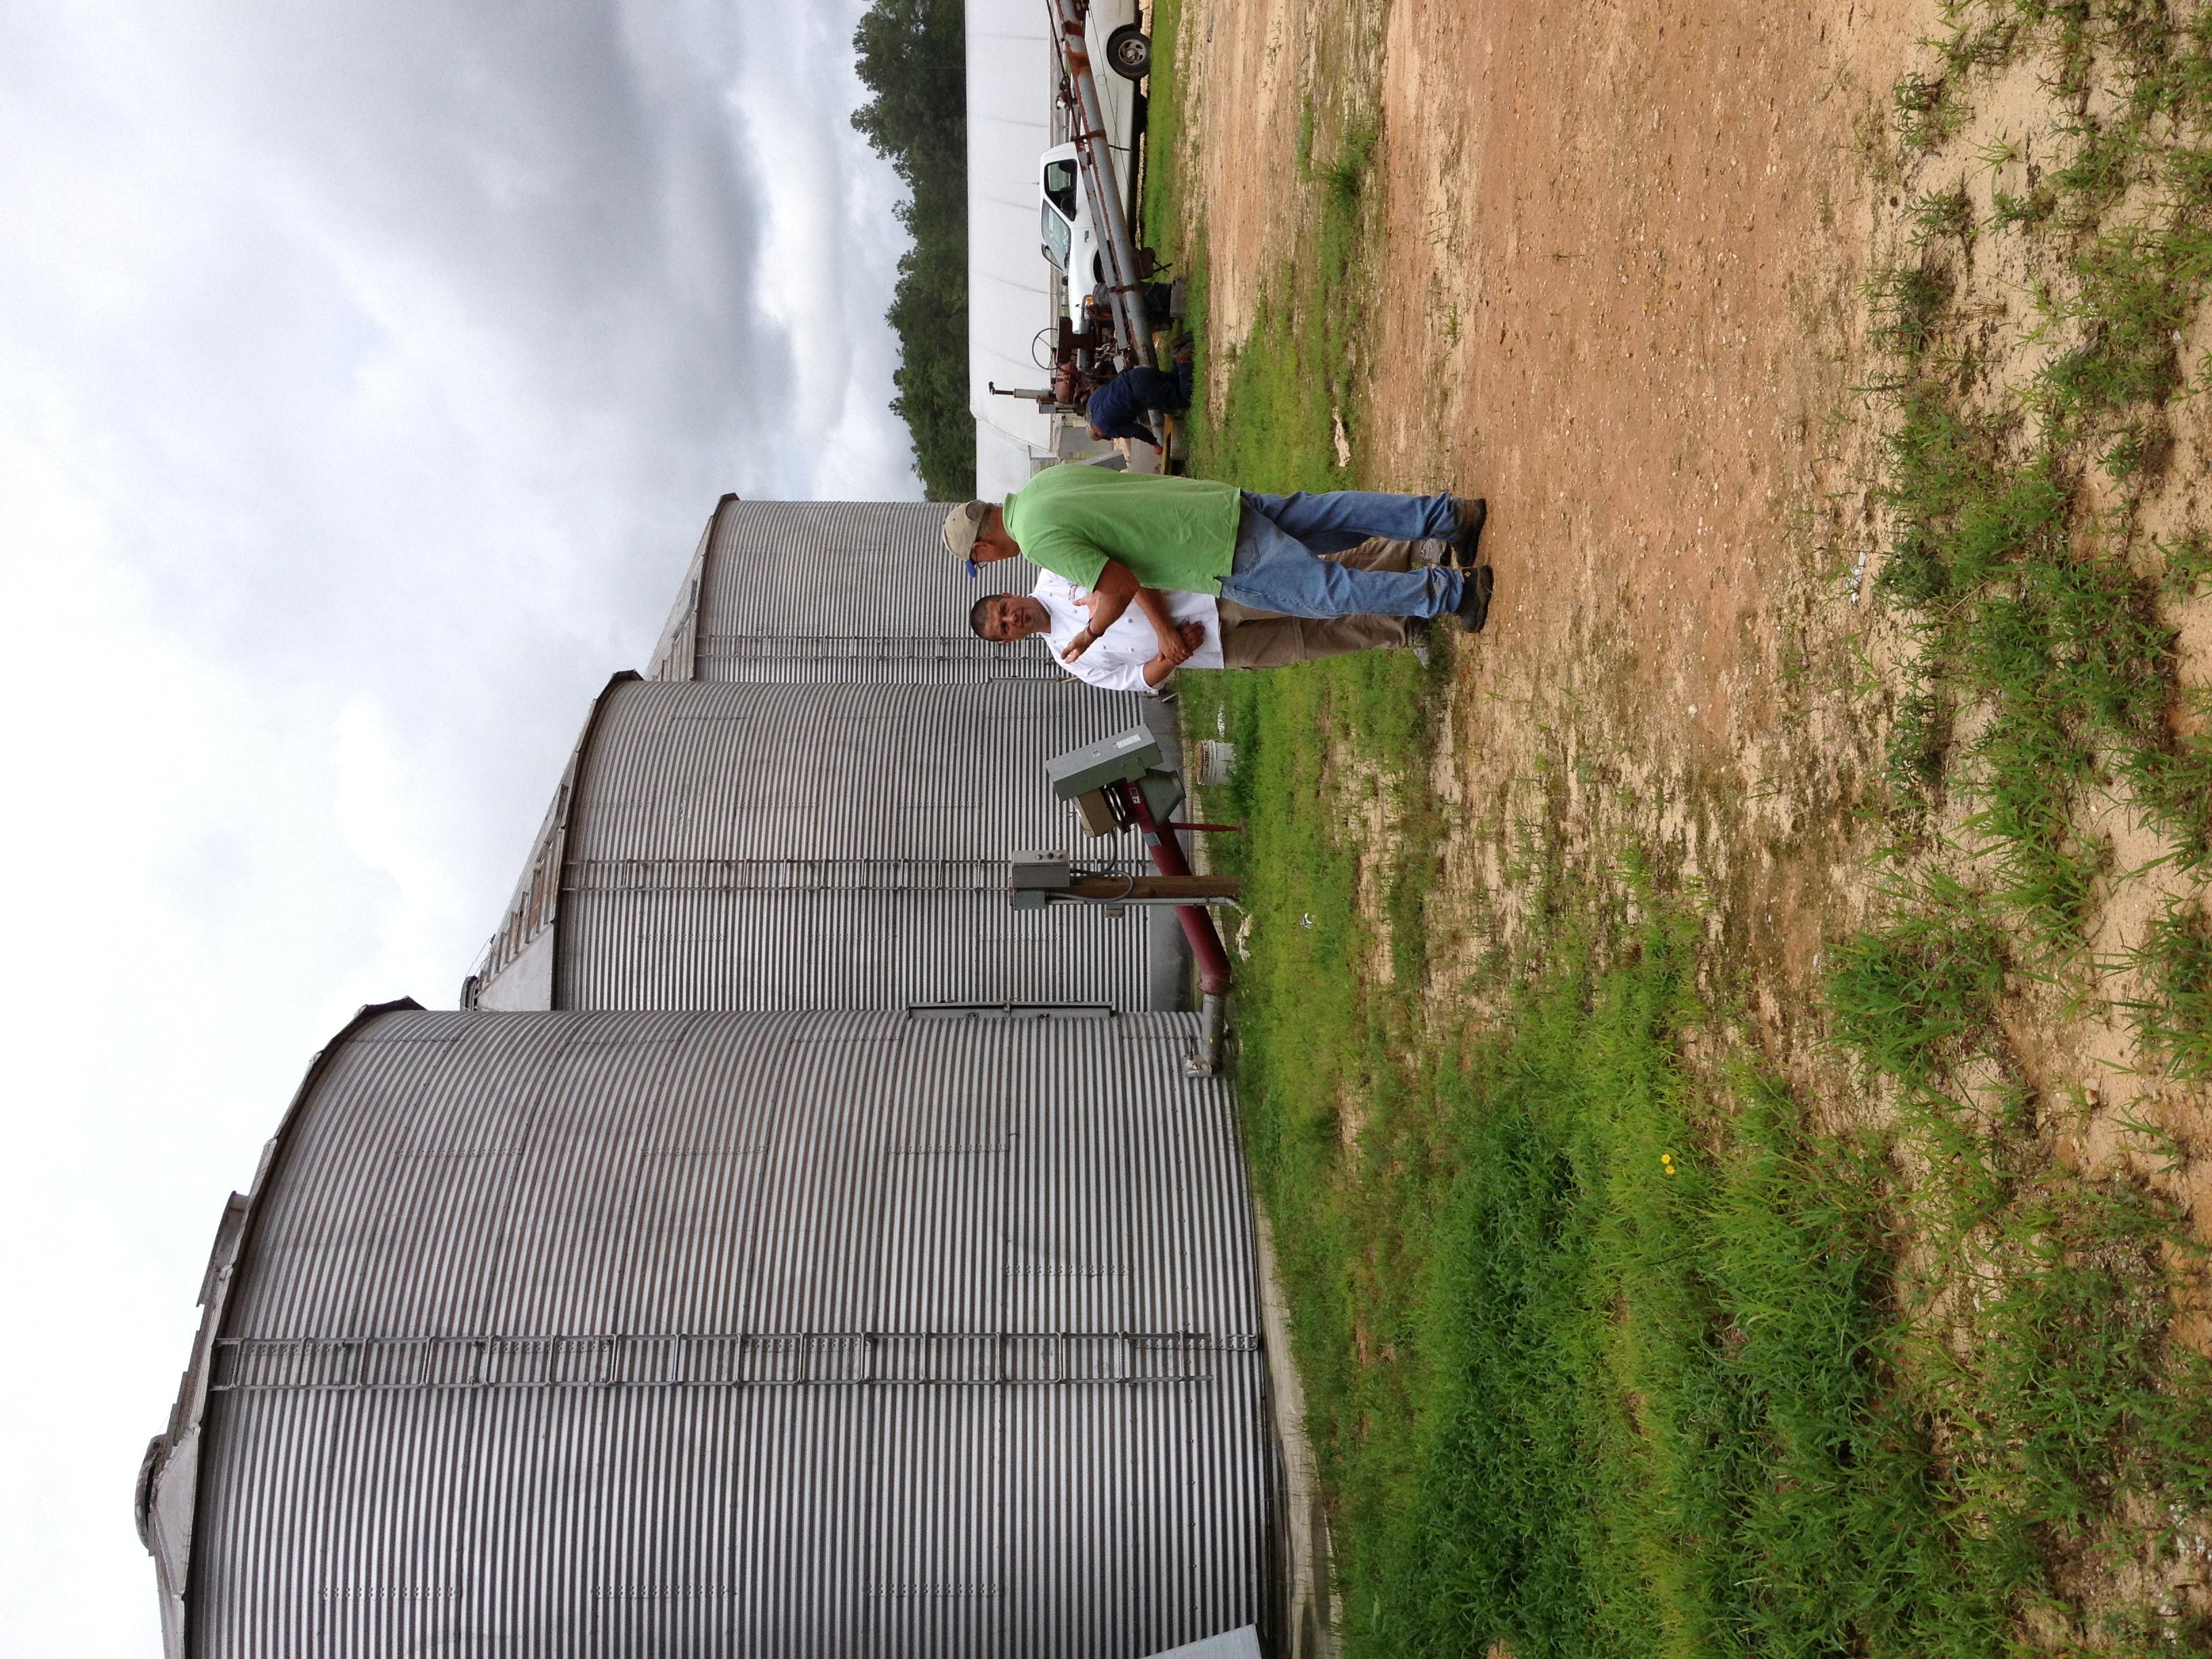 Baker Lionel Vatinet with grower Billy Carter, Carter Farms